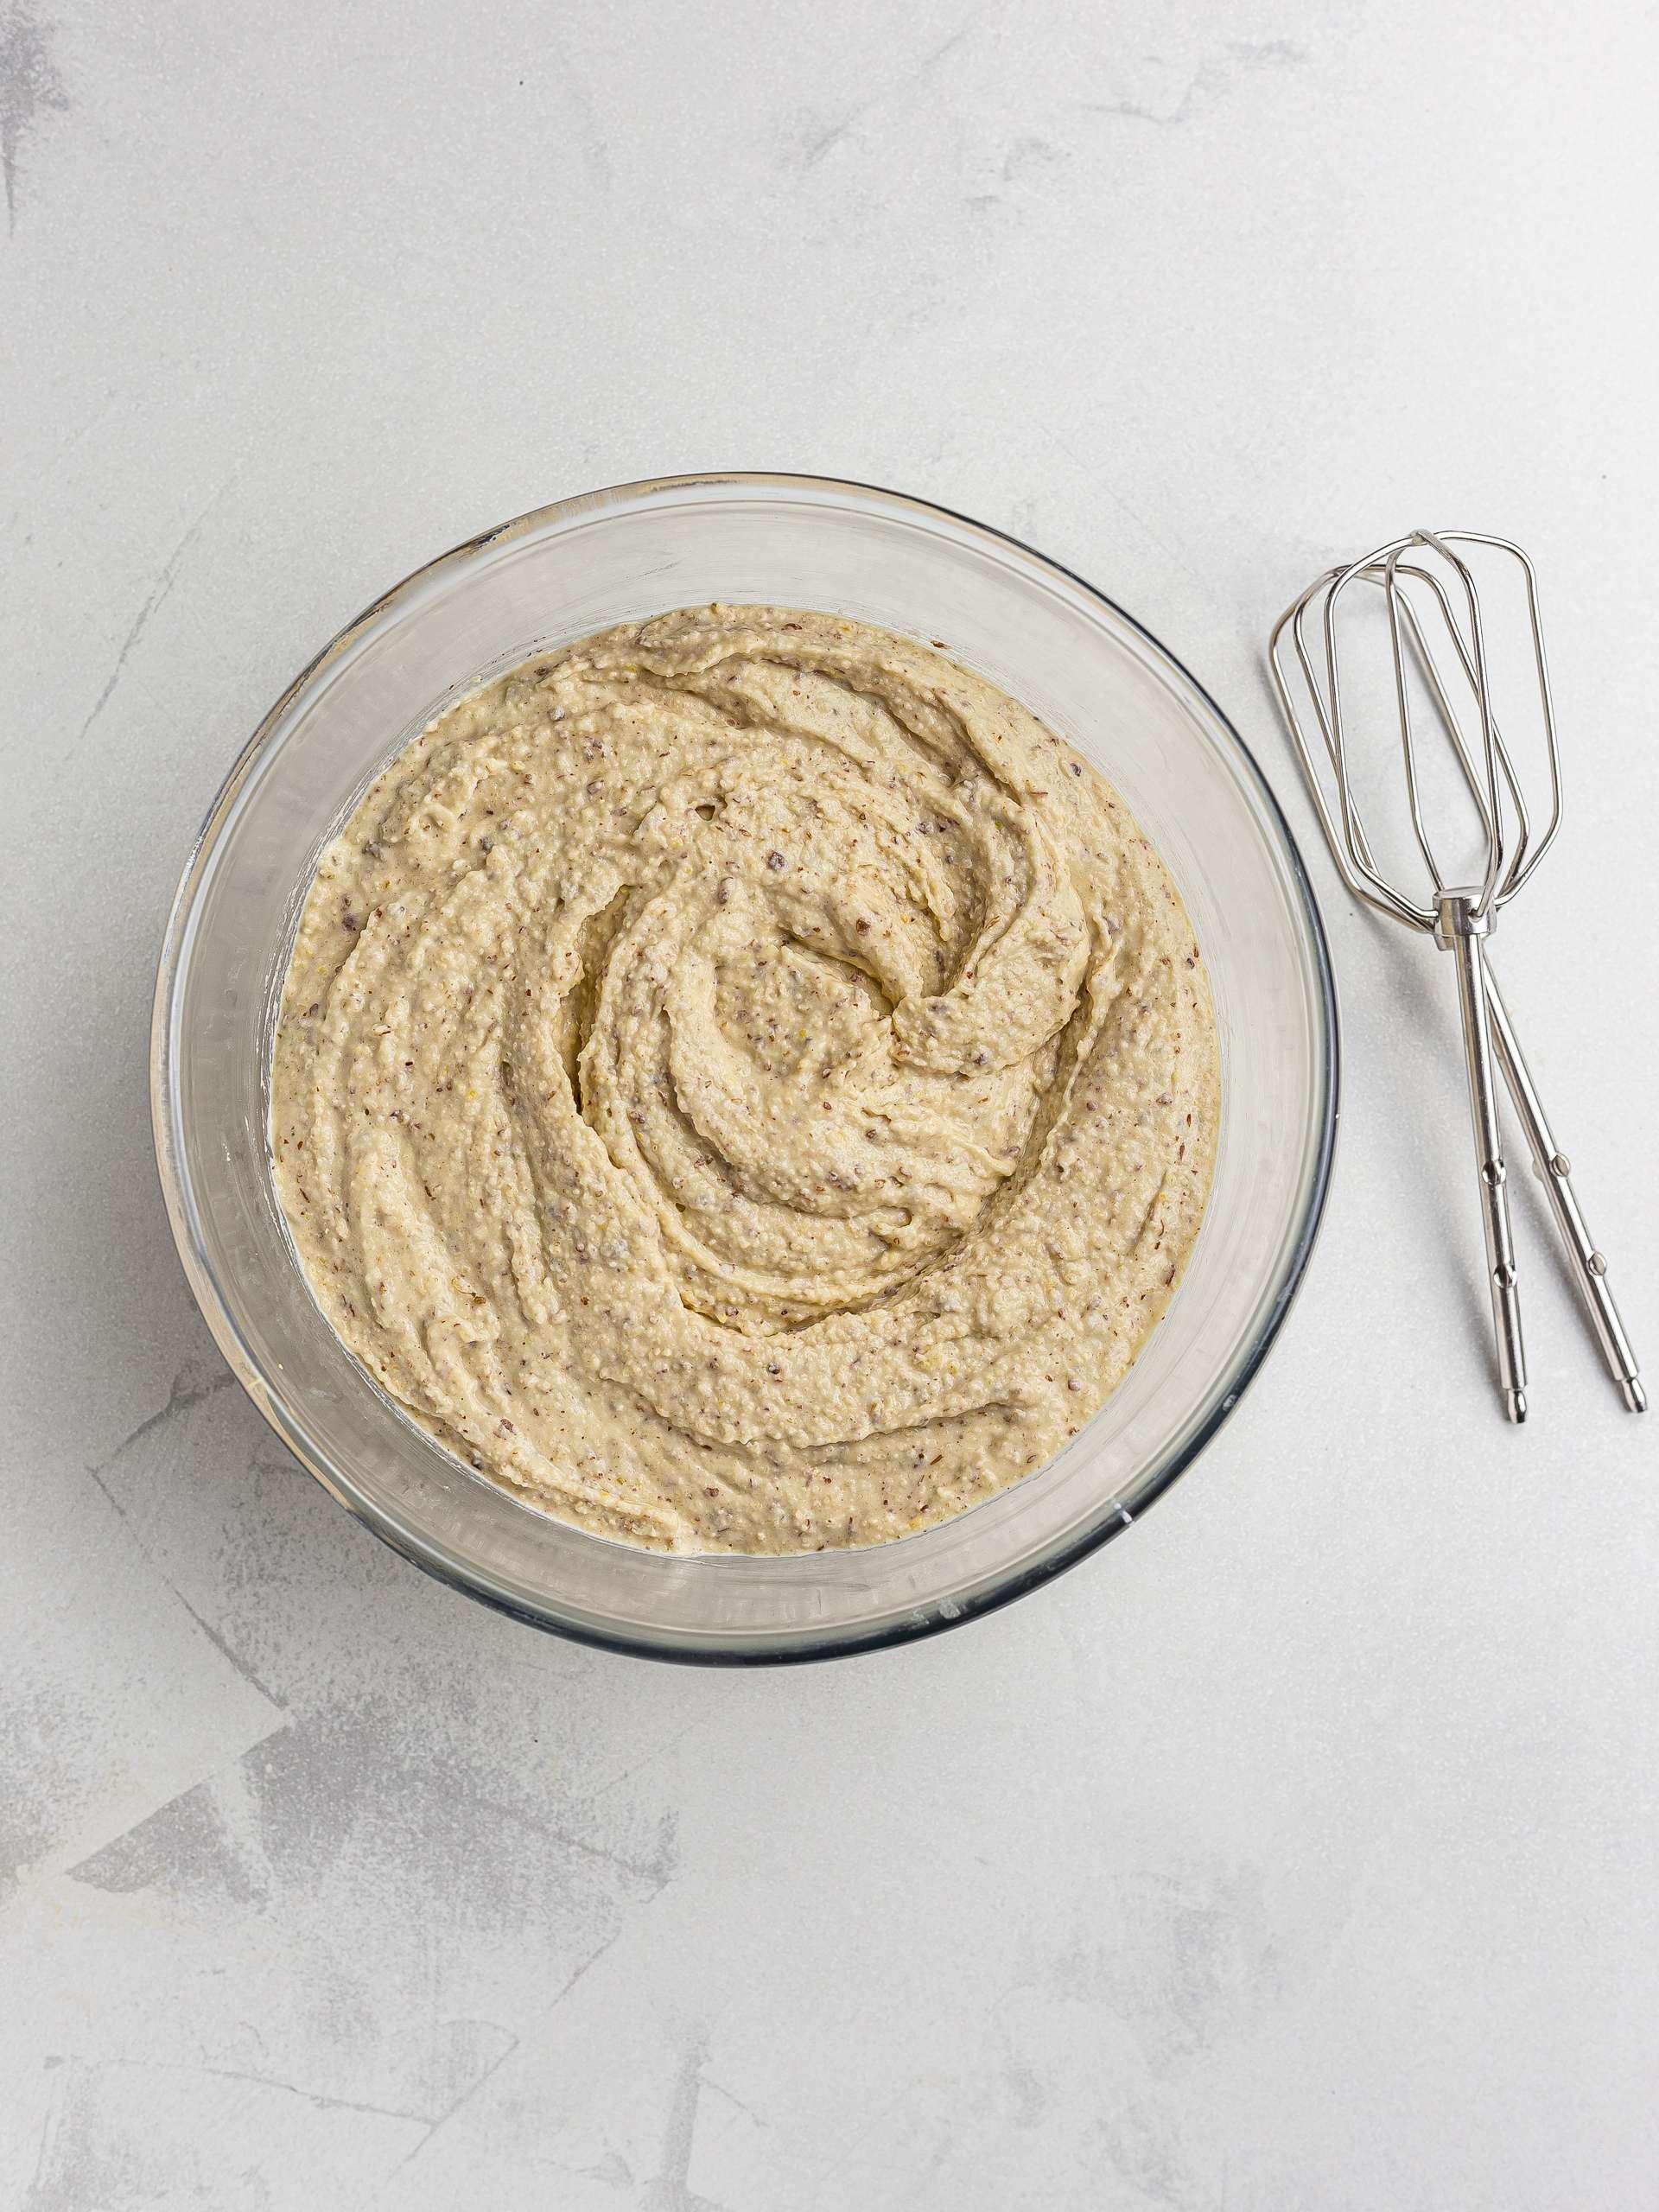 gluten-free cake batter in a bowl